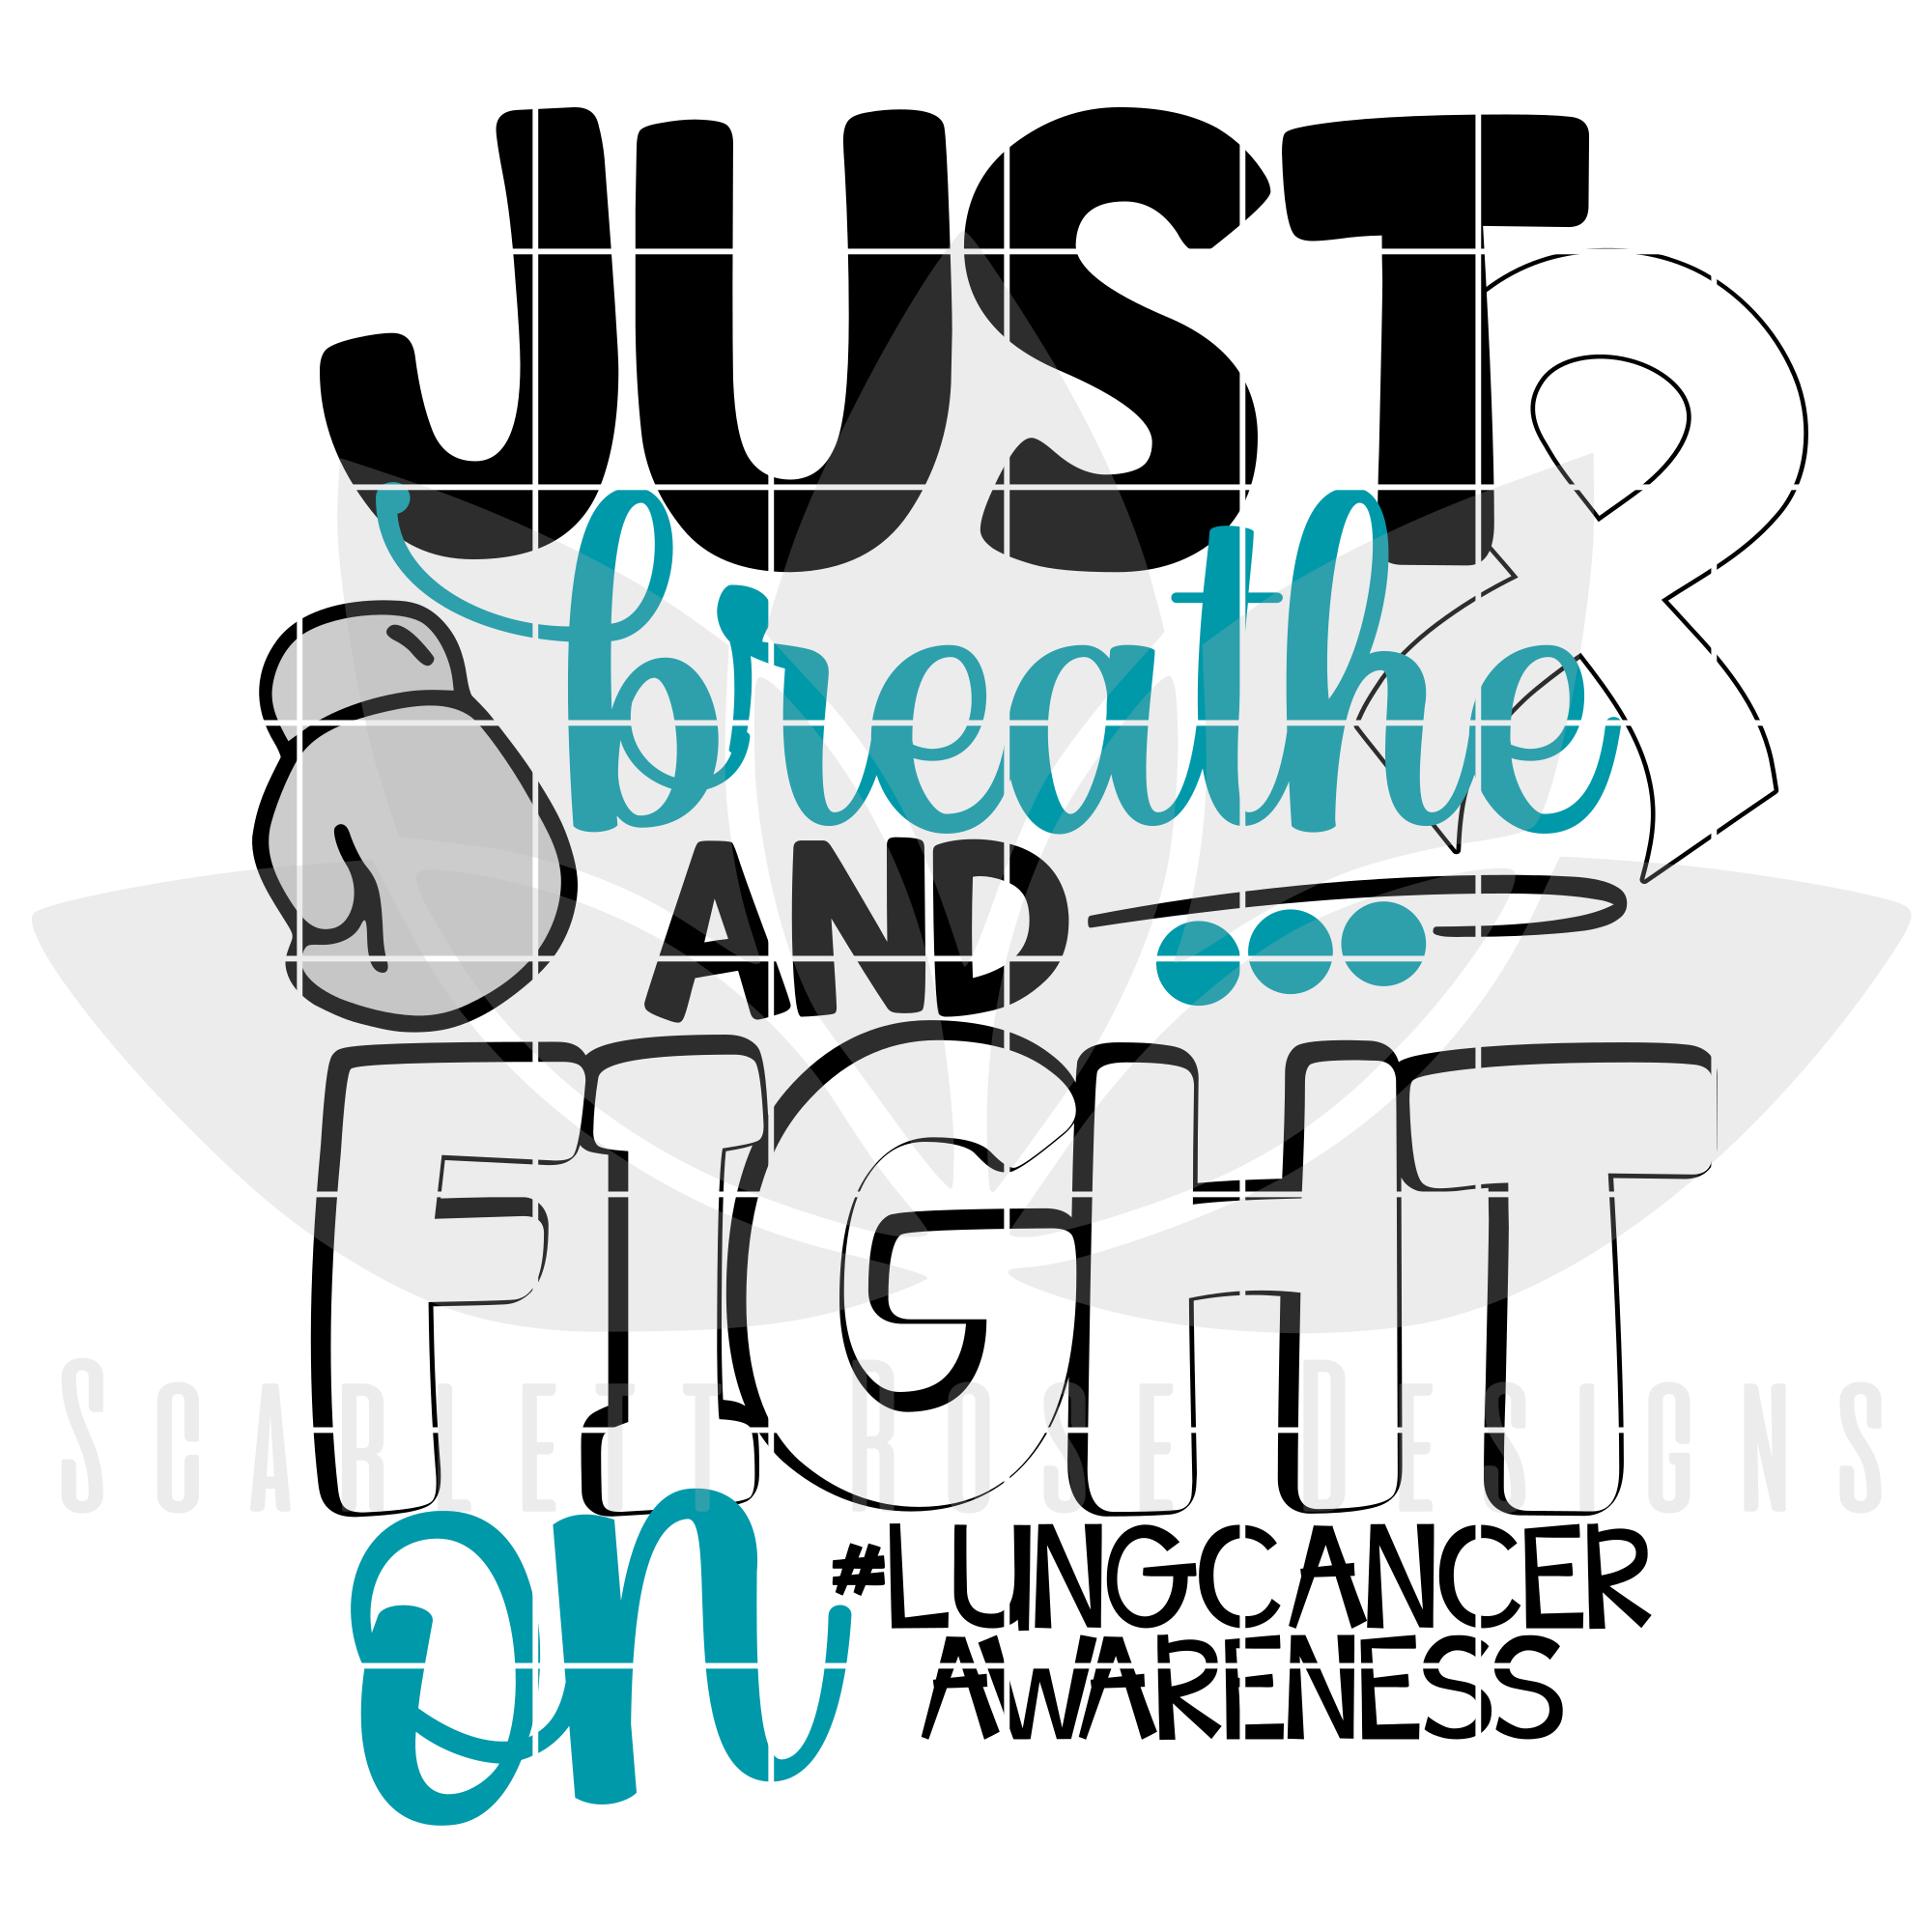 Cancer clipart oncology. Lung awareness hospi noiseworks